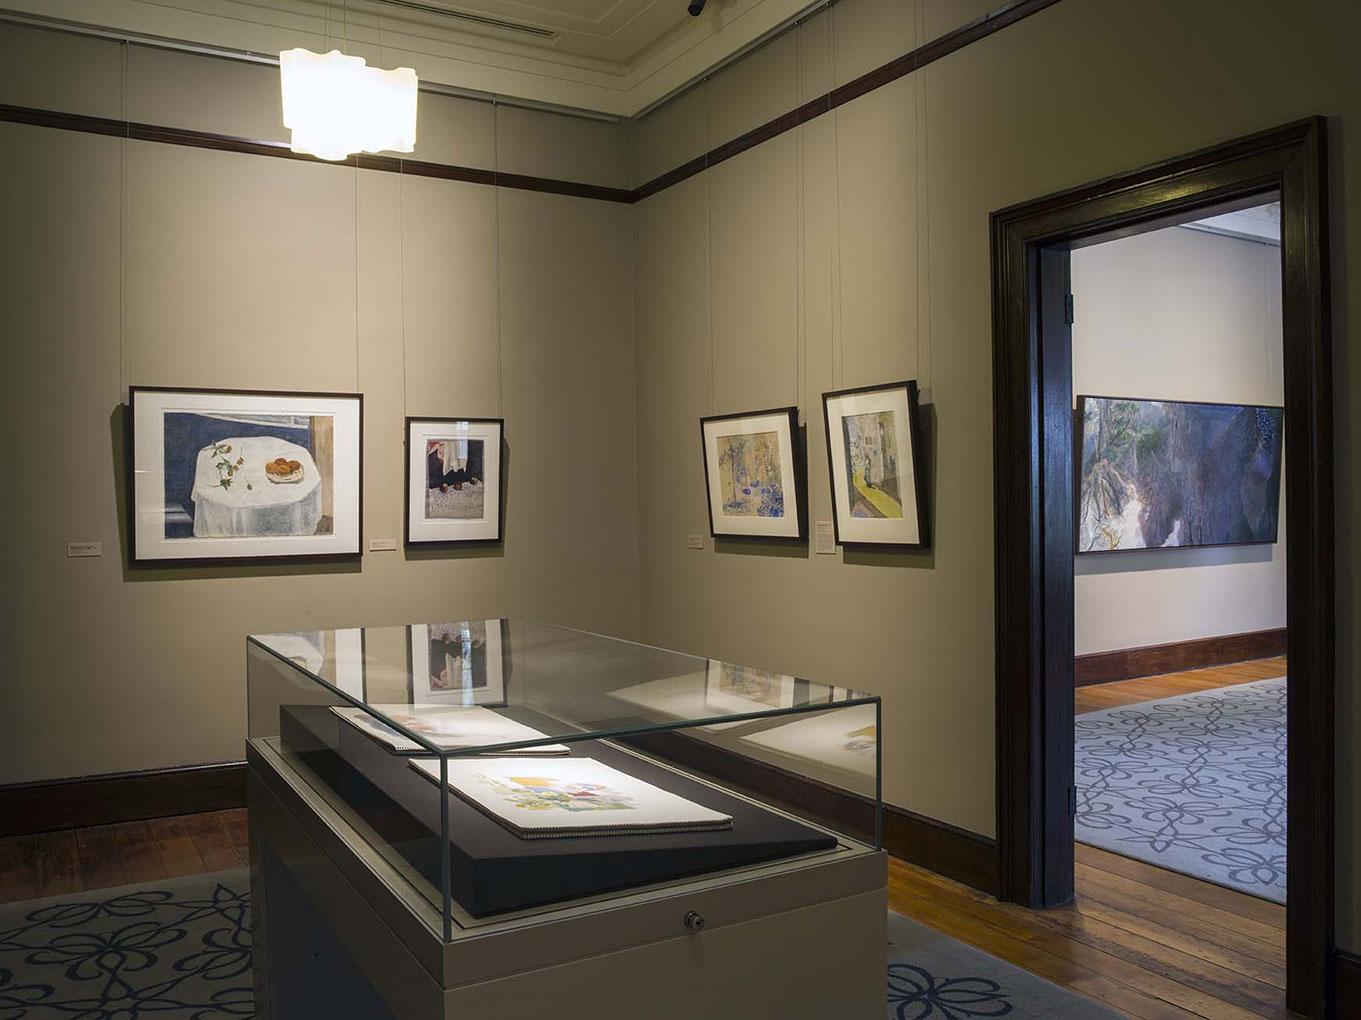 Installation view of 'William Robinson: Infinite sphere', 2014-15. William Robinson Gallery, Brisbane. Photo: Carl Warner